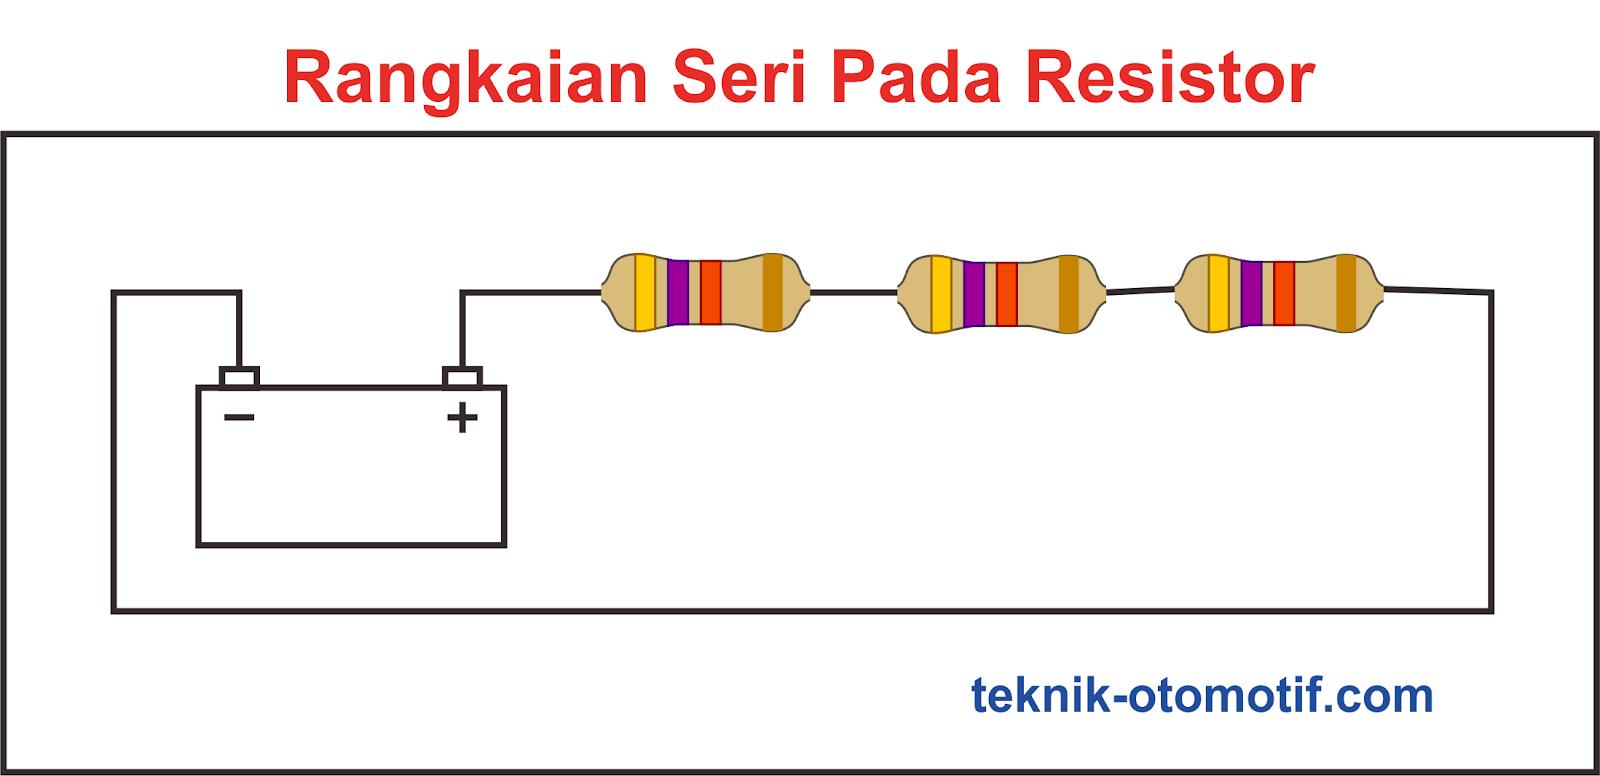 Perbedaan Rangkaian Seri Dan Paralel Teknik Otomotifcom